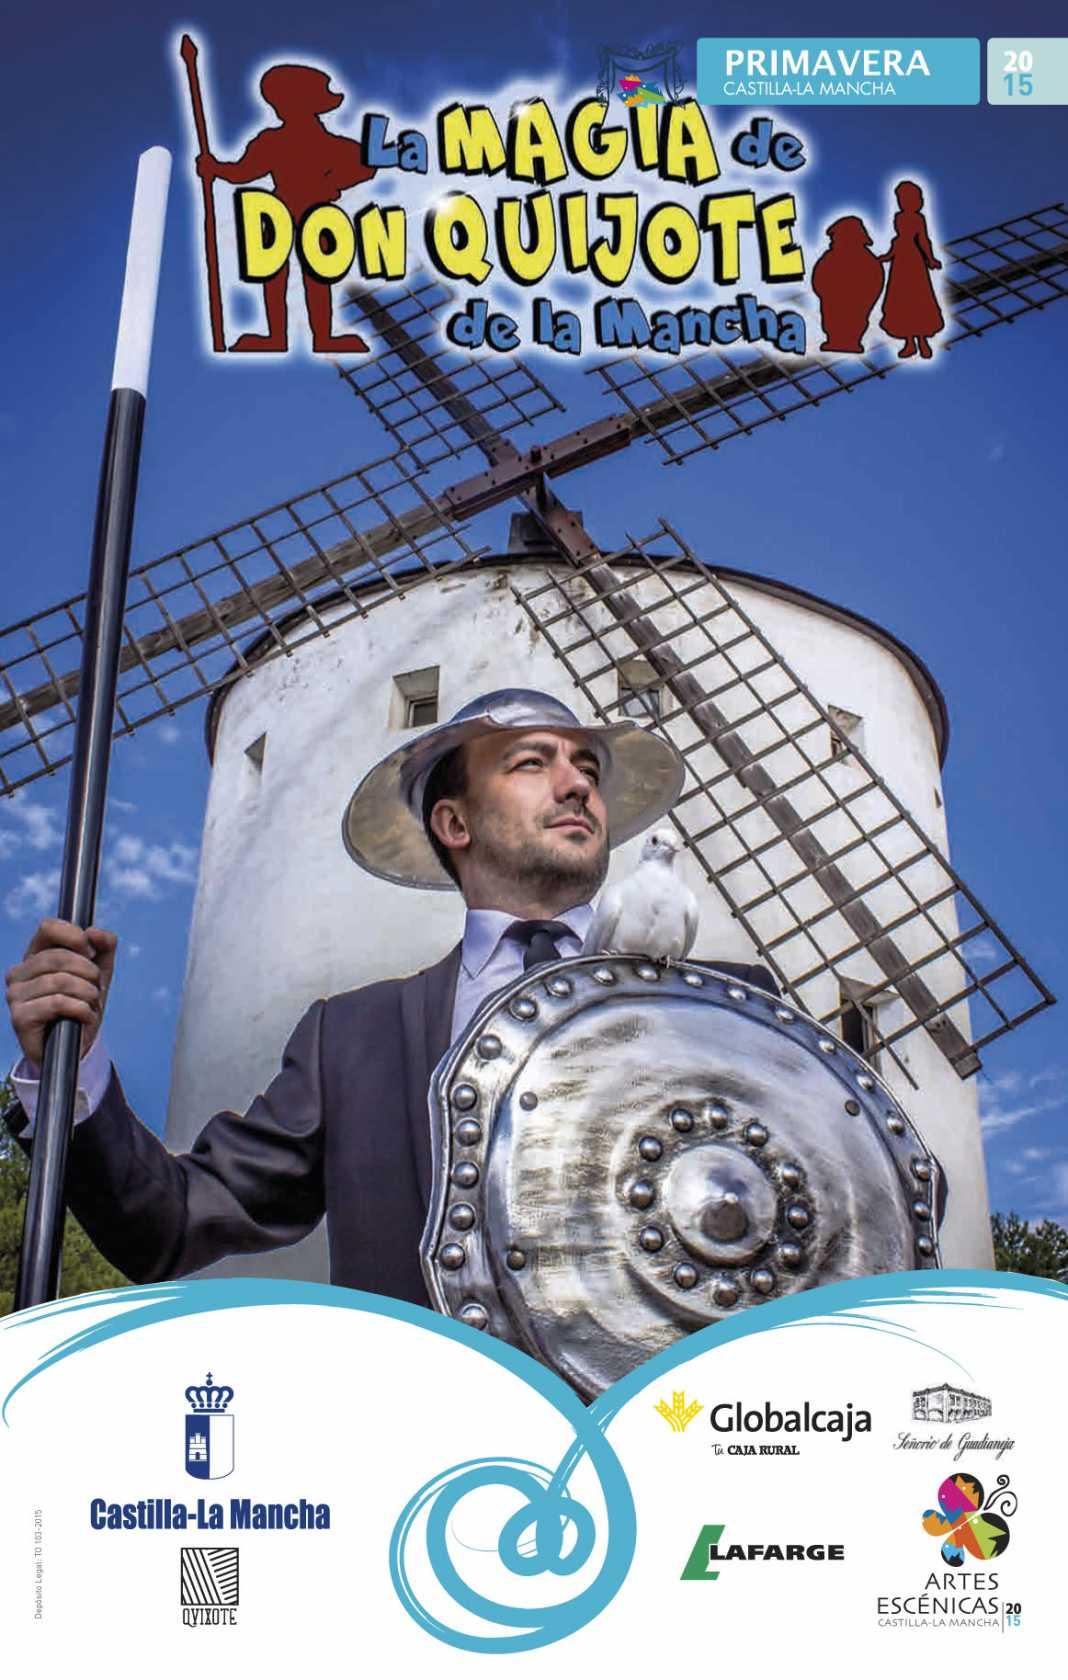 6901 cartel PRODUCCONES KN La MAGIA DE Don Quijote  1068x1680 - A escena la magia de Don Quijote de La Mancha